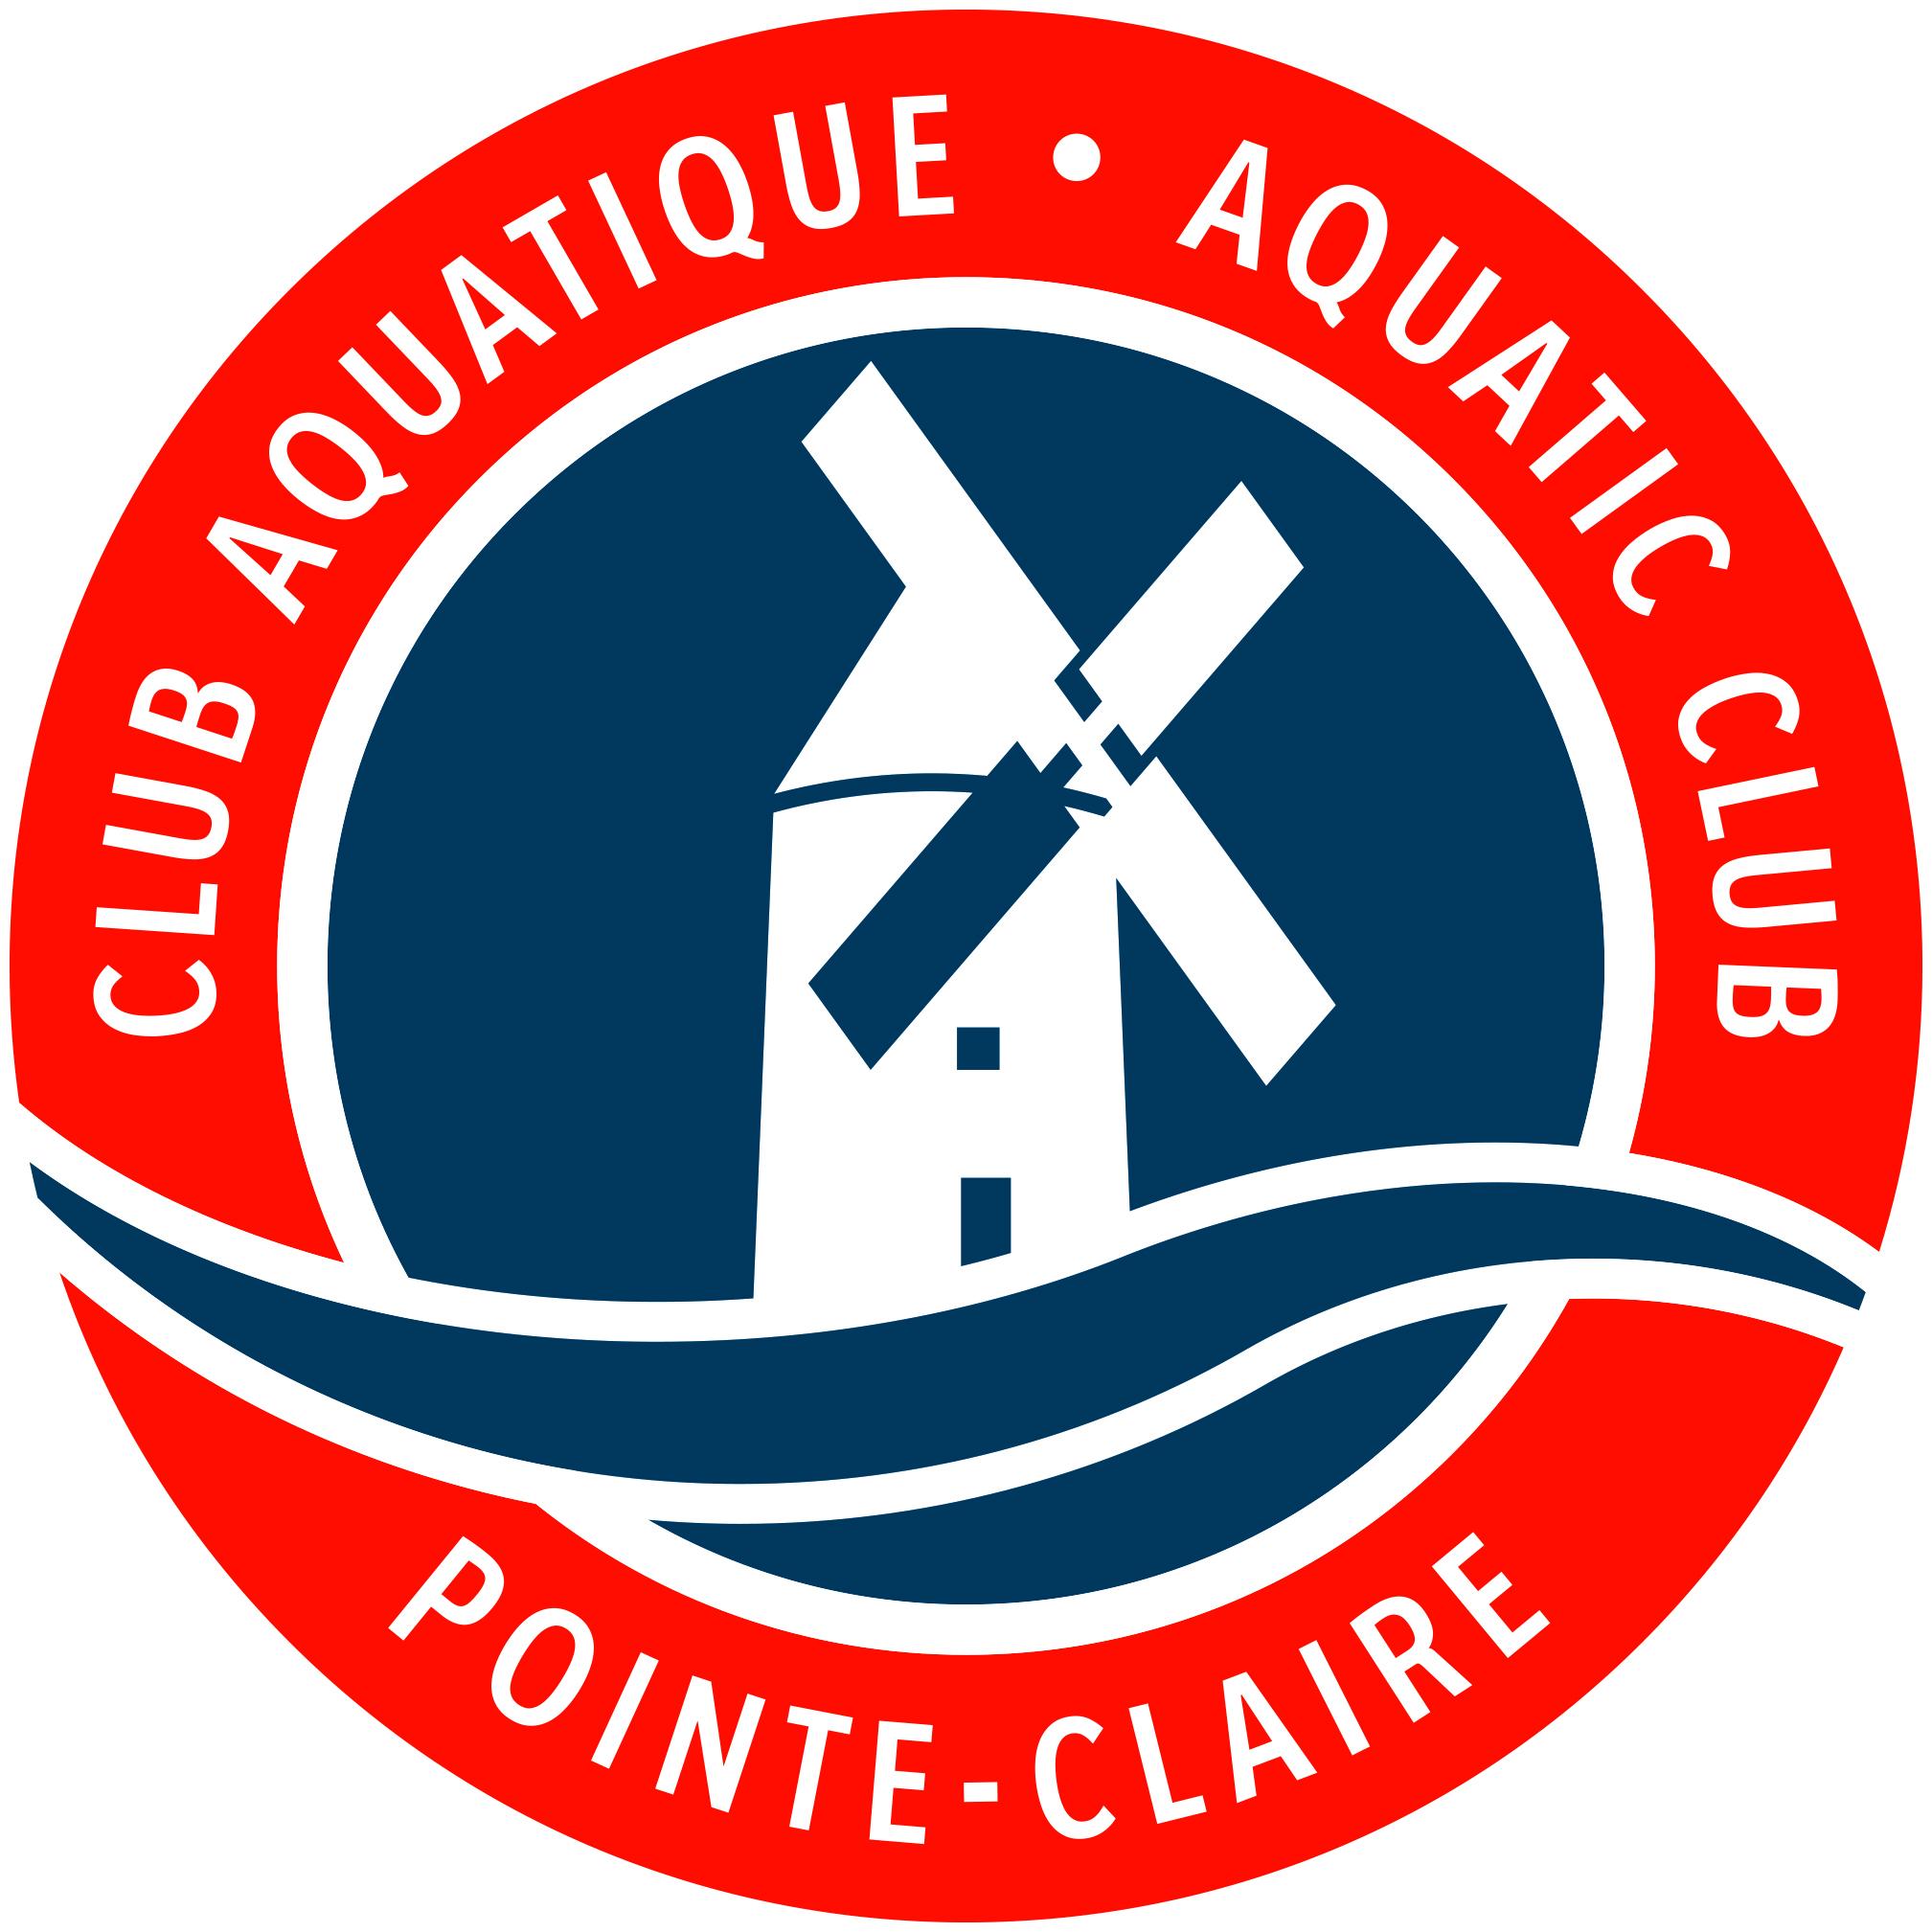 Club Aquatique - Aquatic Club Pointe-Claire